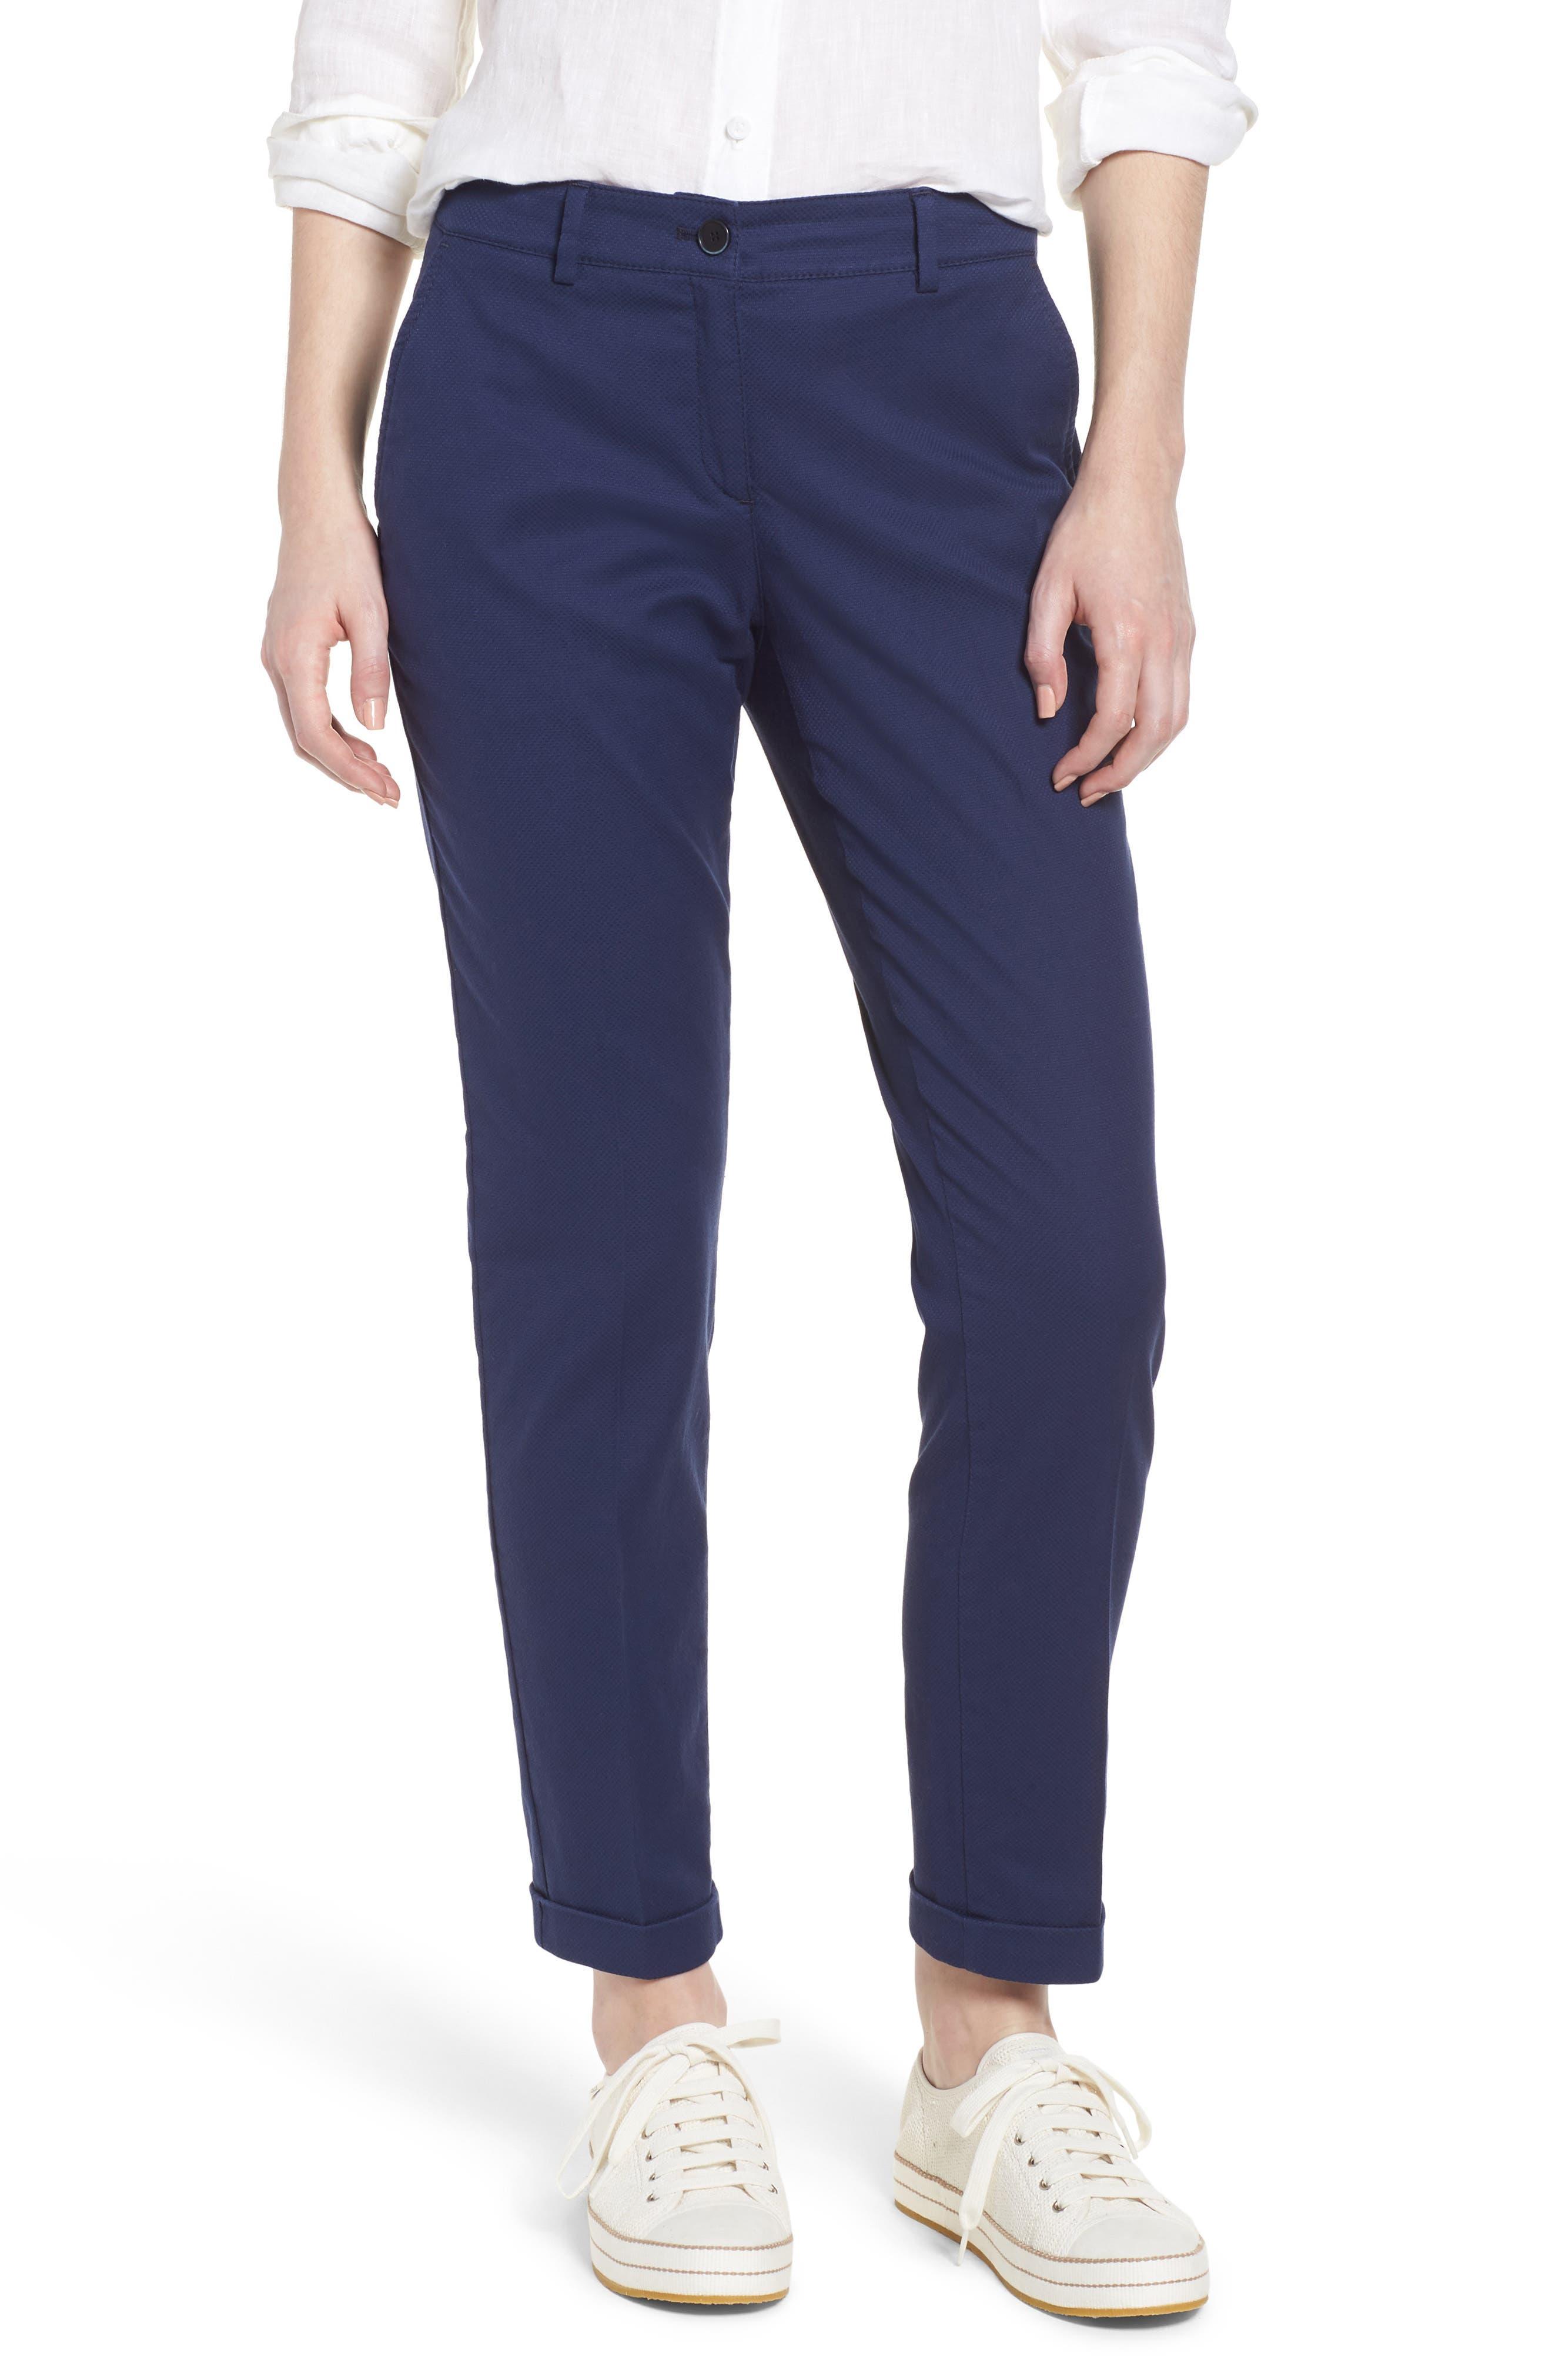 Maron Cuffed Straight Leg Pants,                             Main thumbnail 1, color,                             422